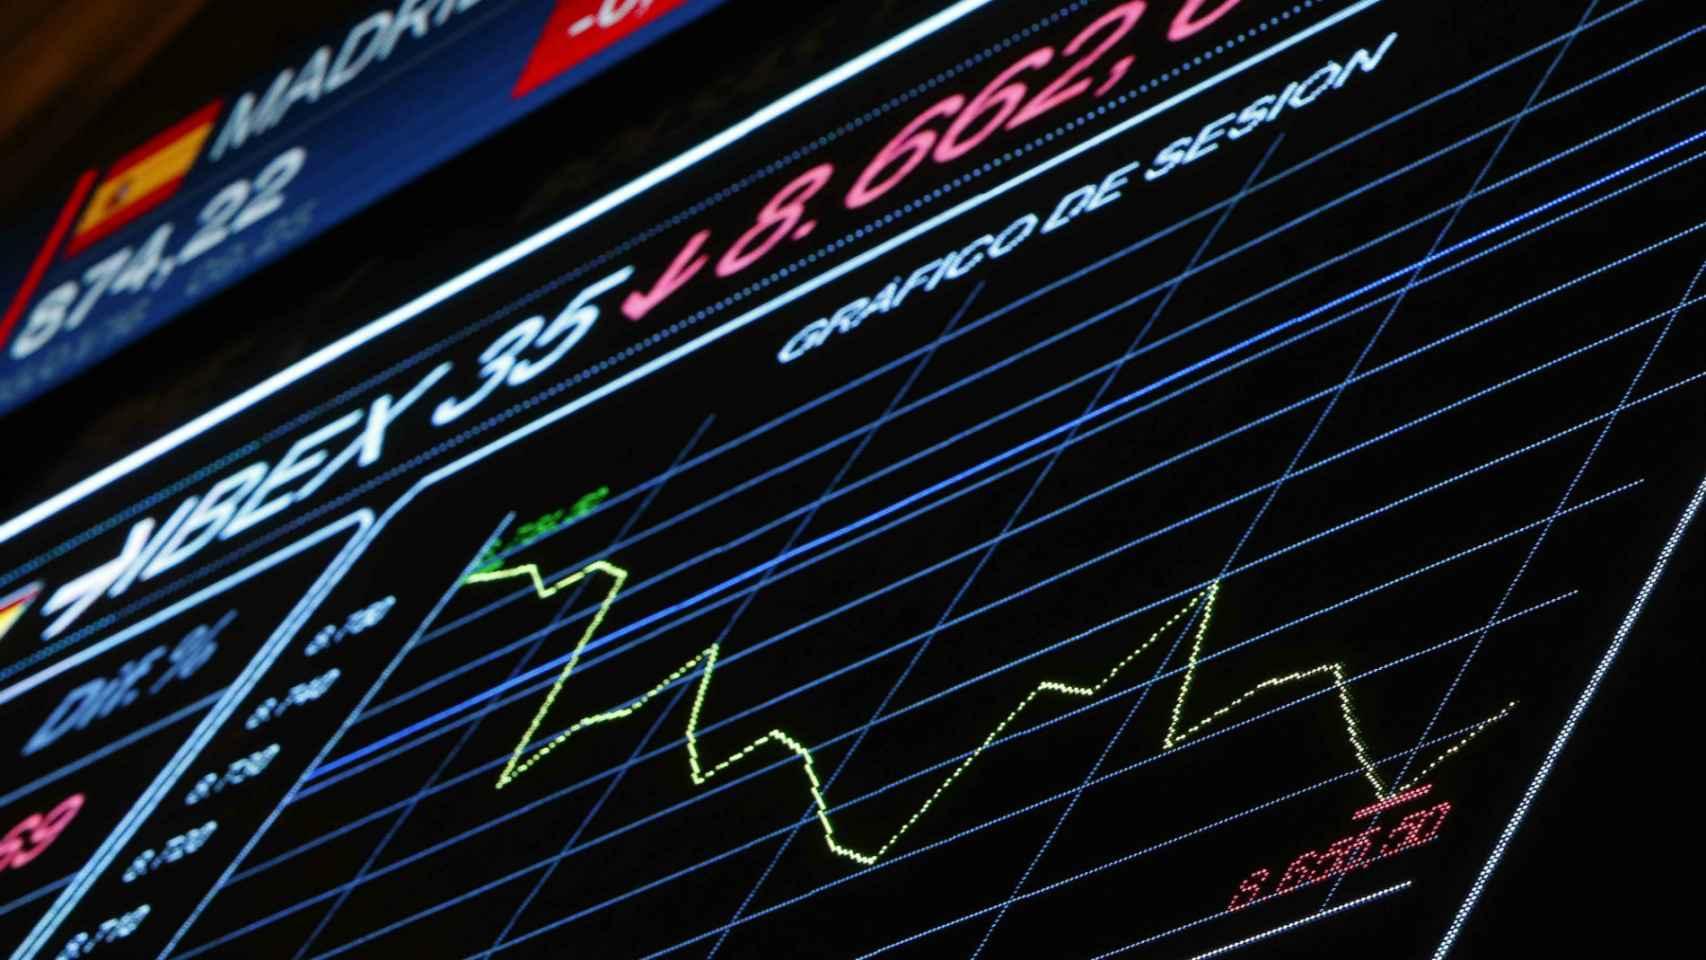 La incertidumbre aterriza el Ibex: la Bolsa española cae el doble que la europea